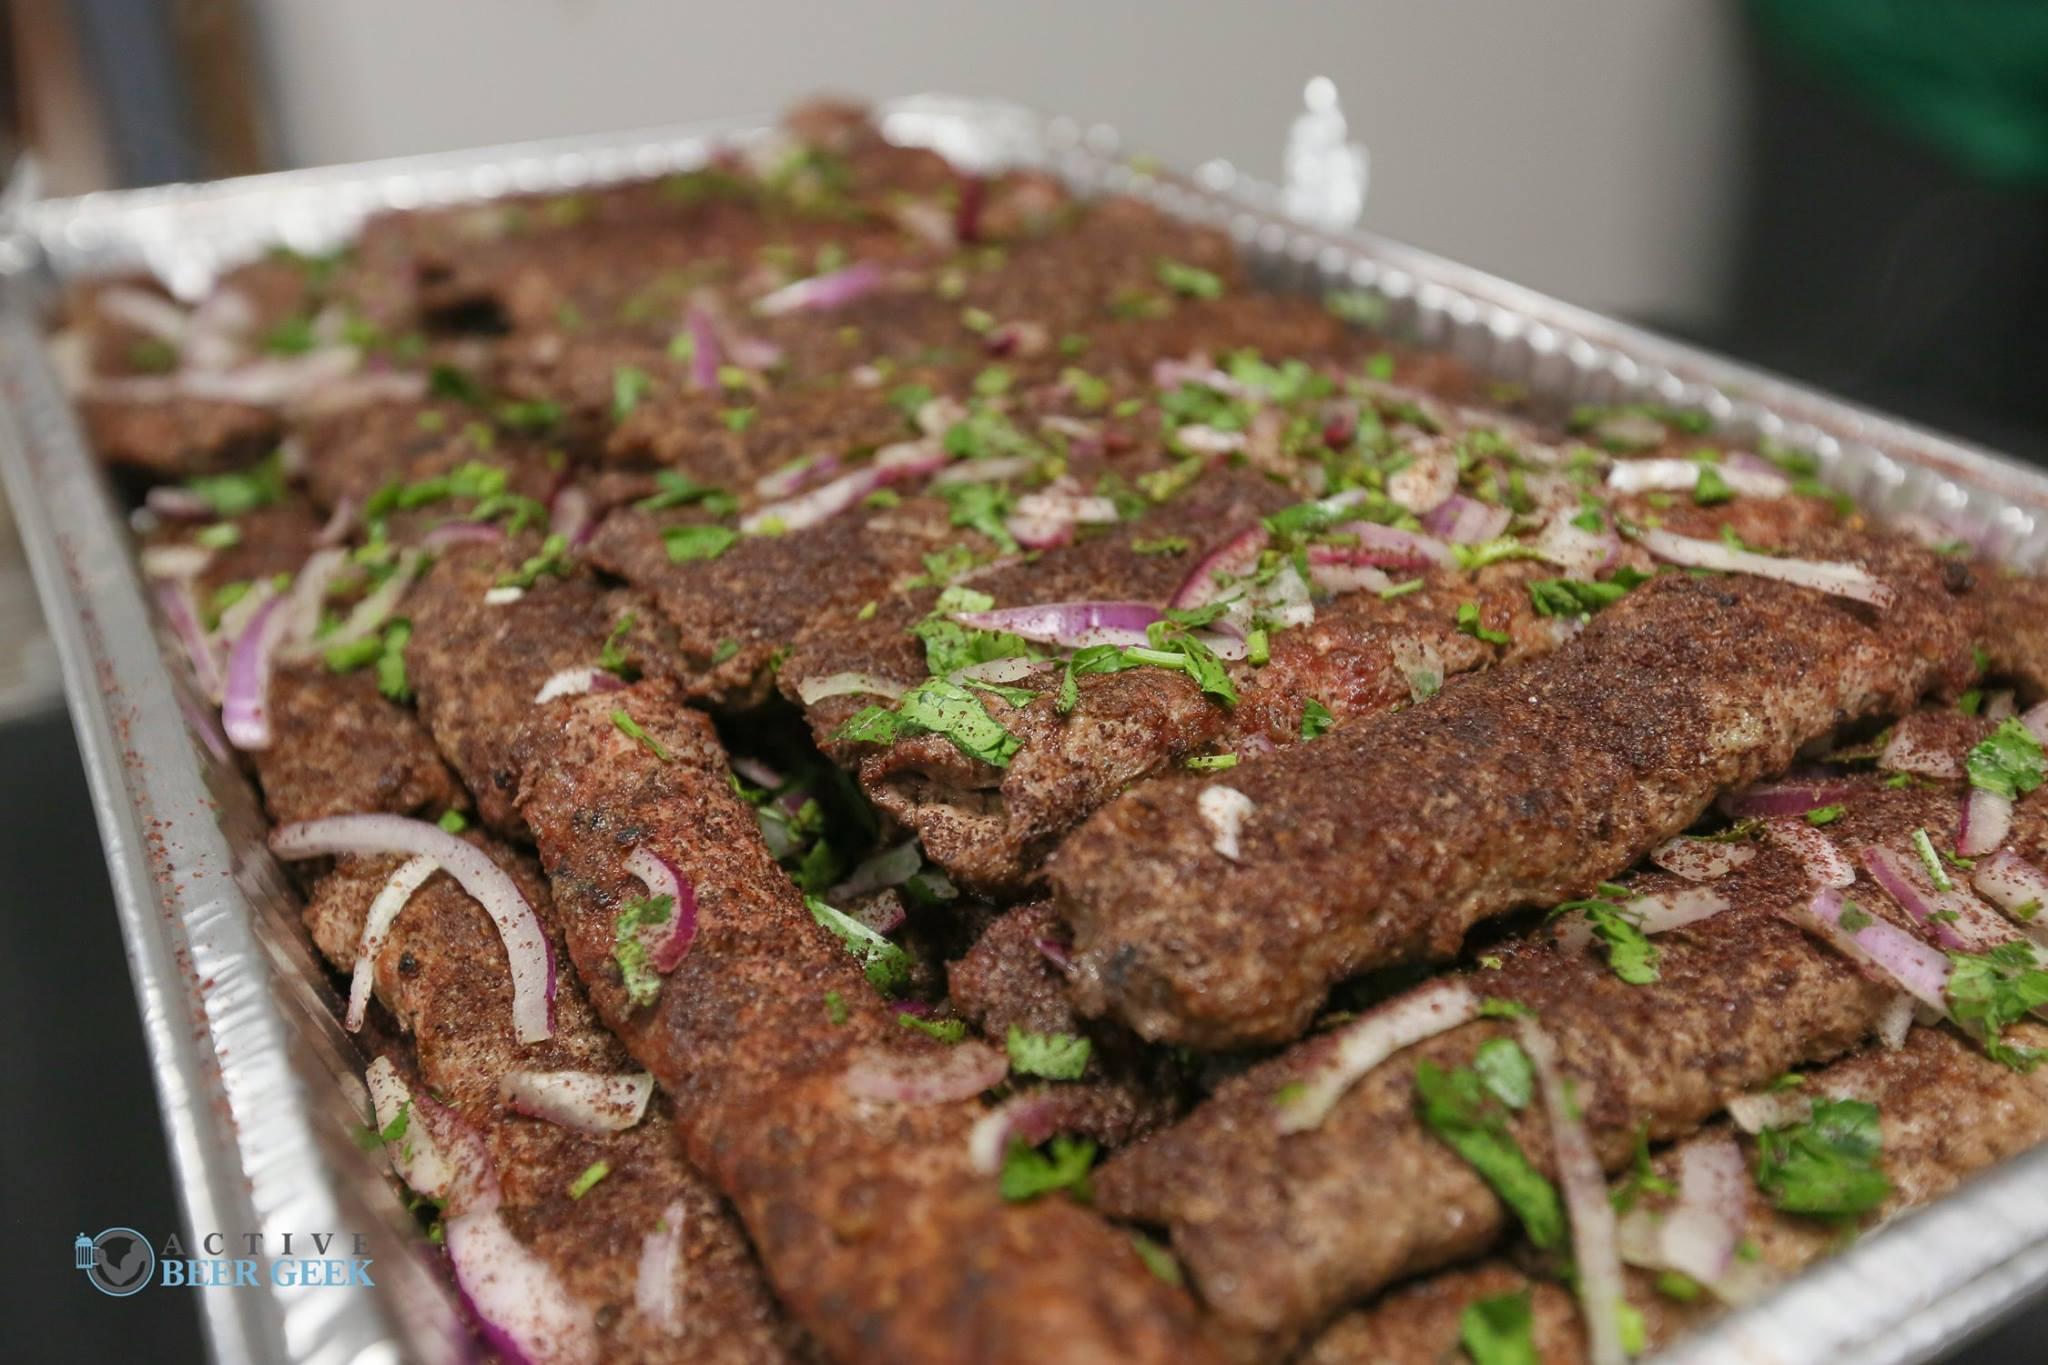 Babylon's Beef Shish Kabobs